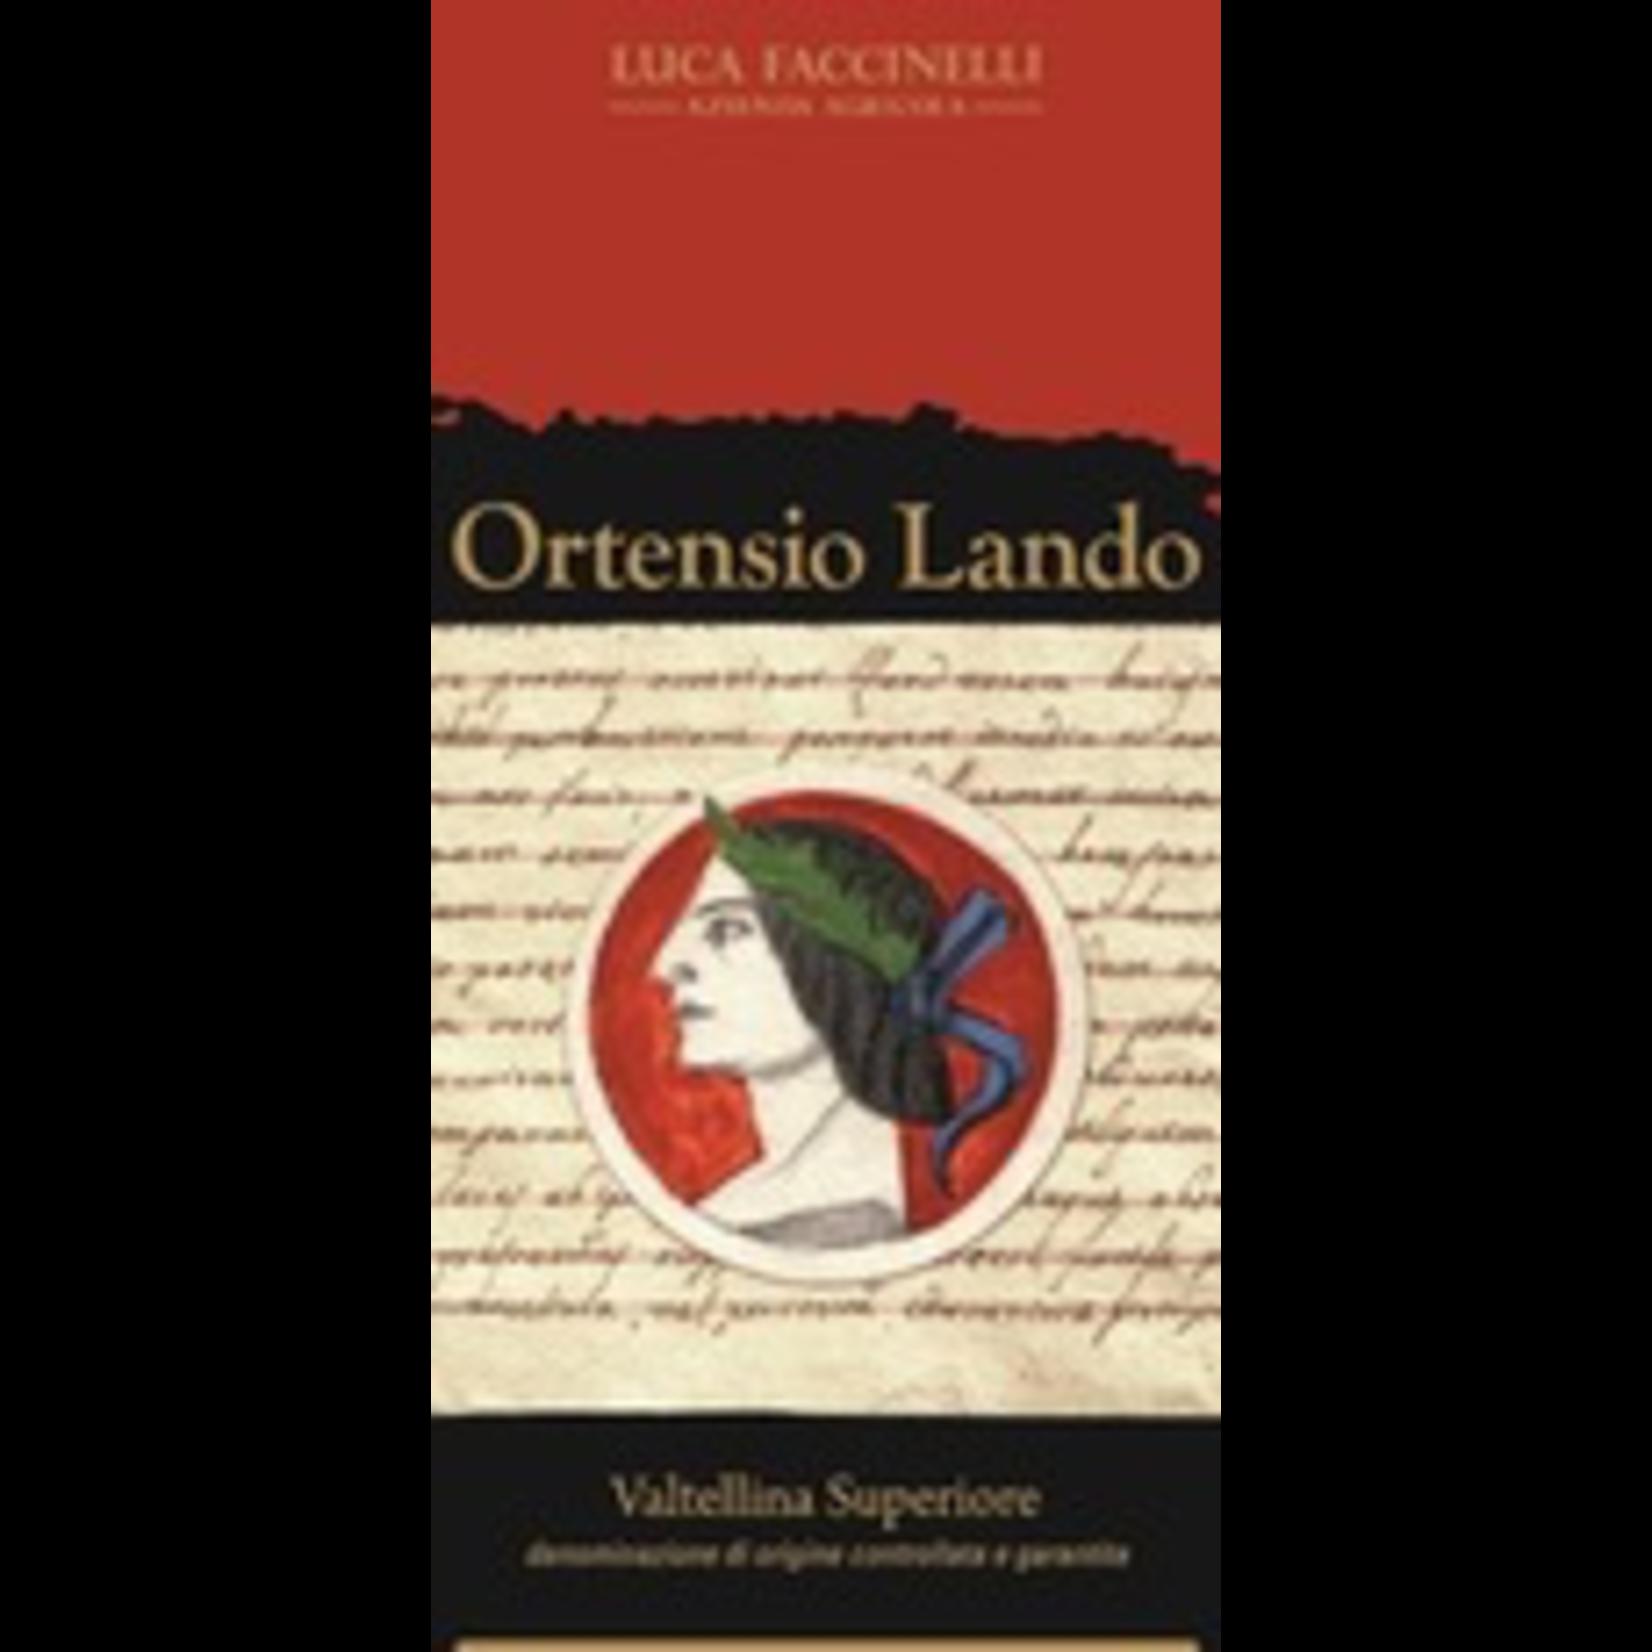 Wine Luca Faccinelli Valtellina Superiore Ortensio Lando 2013